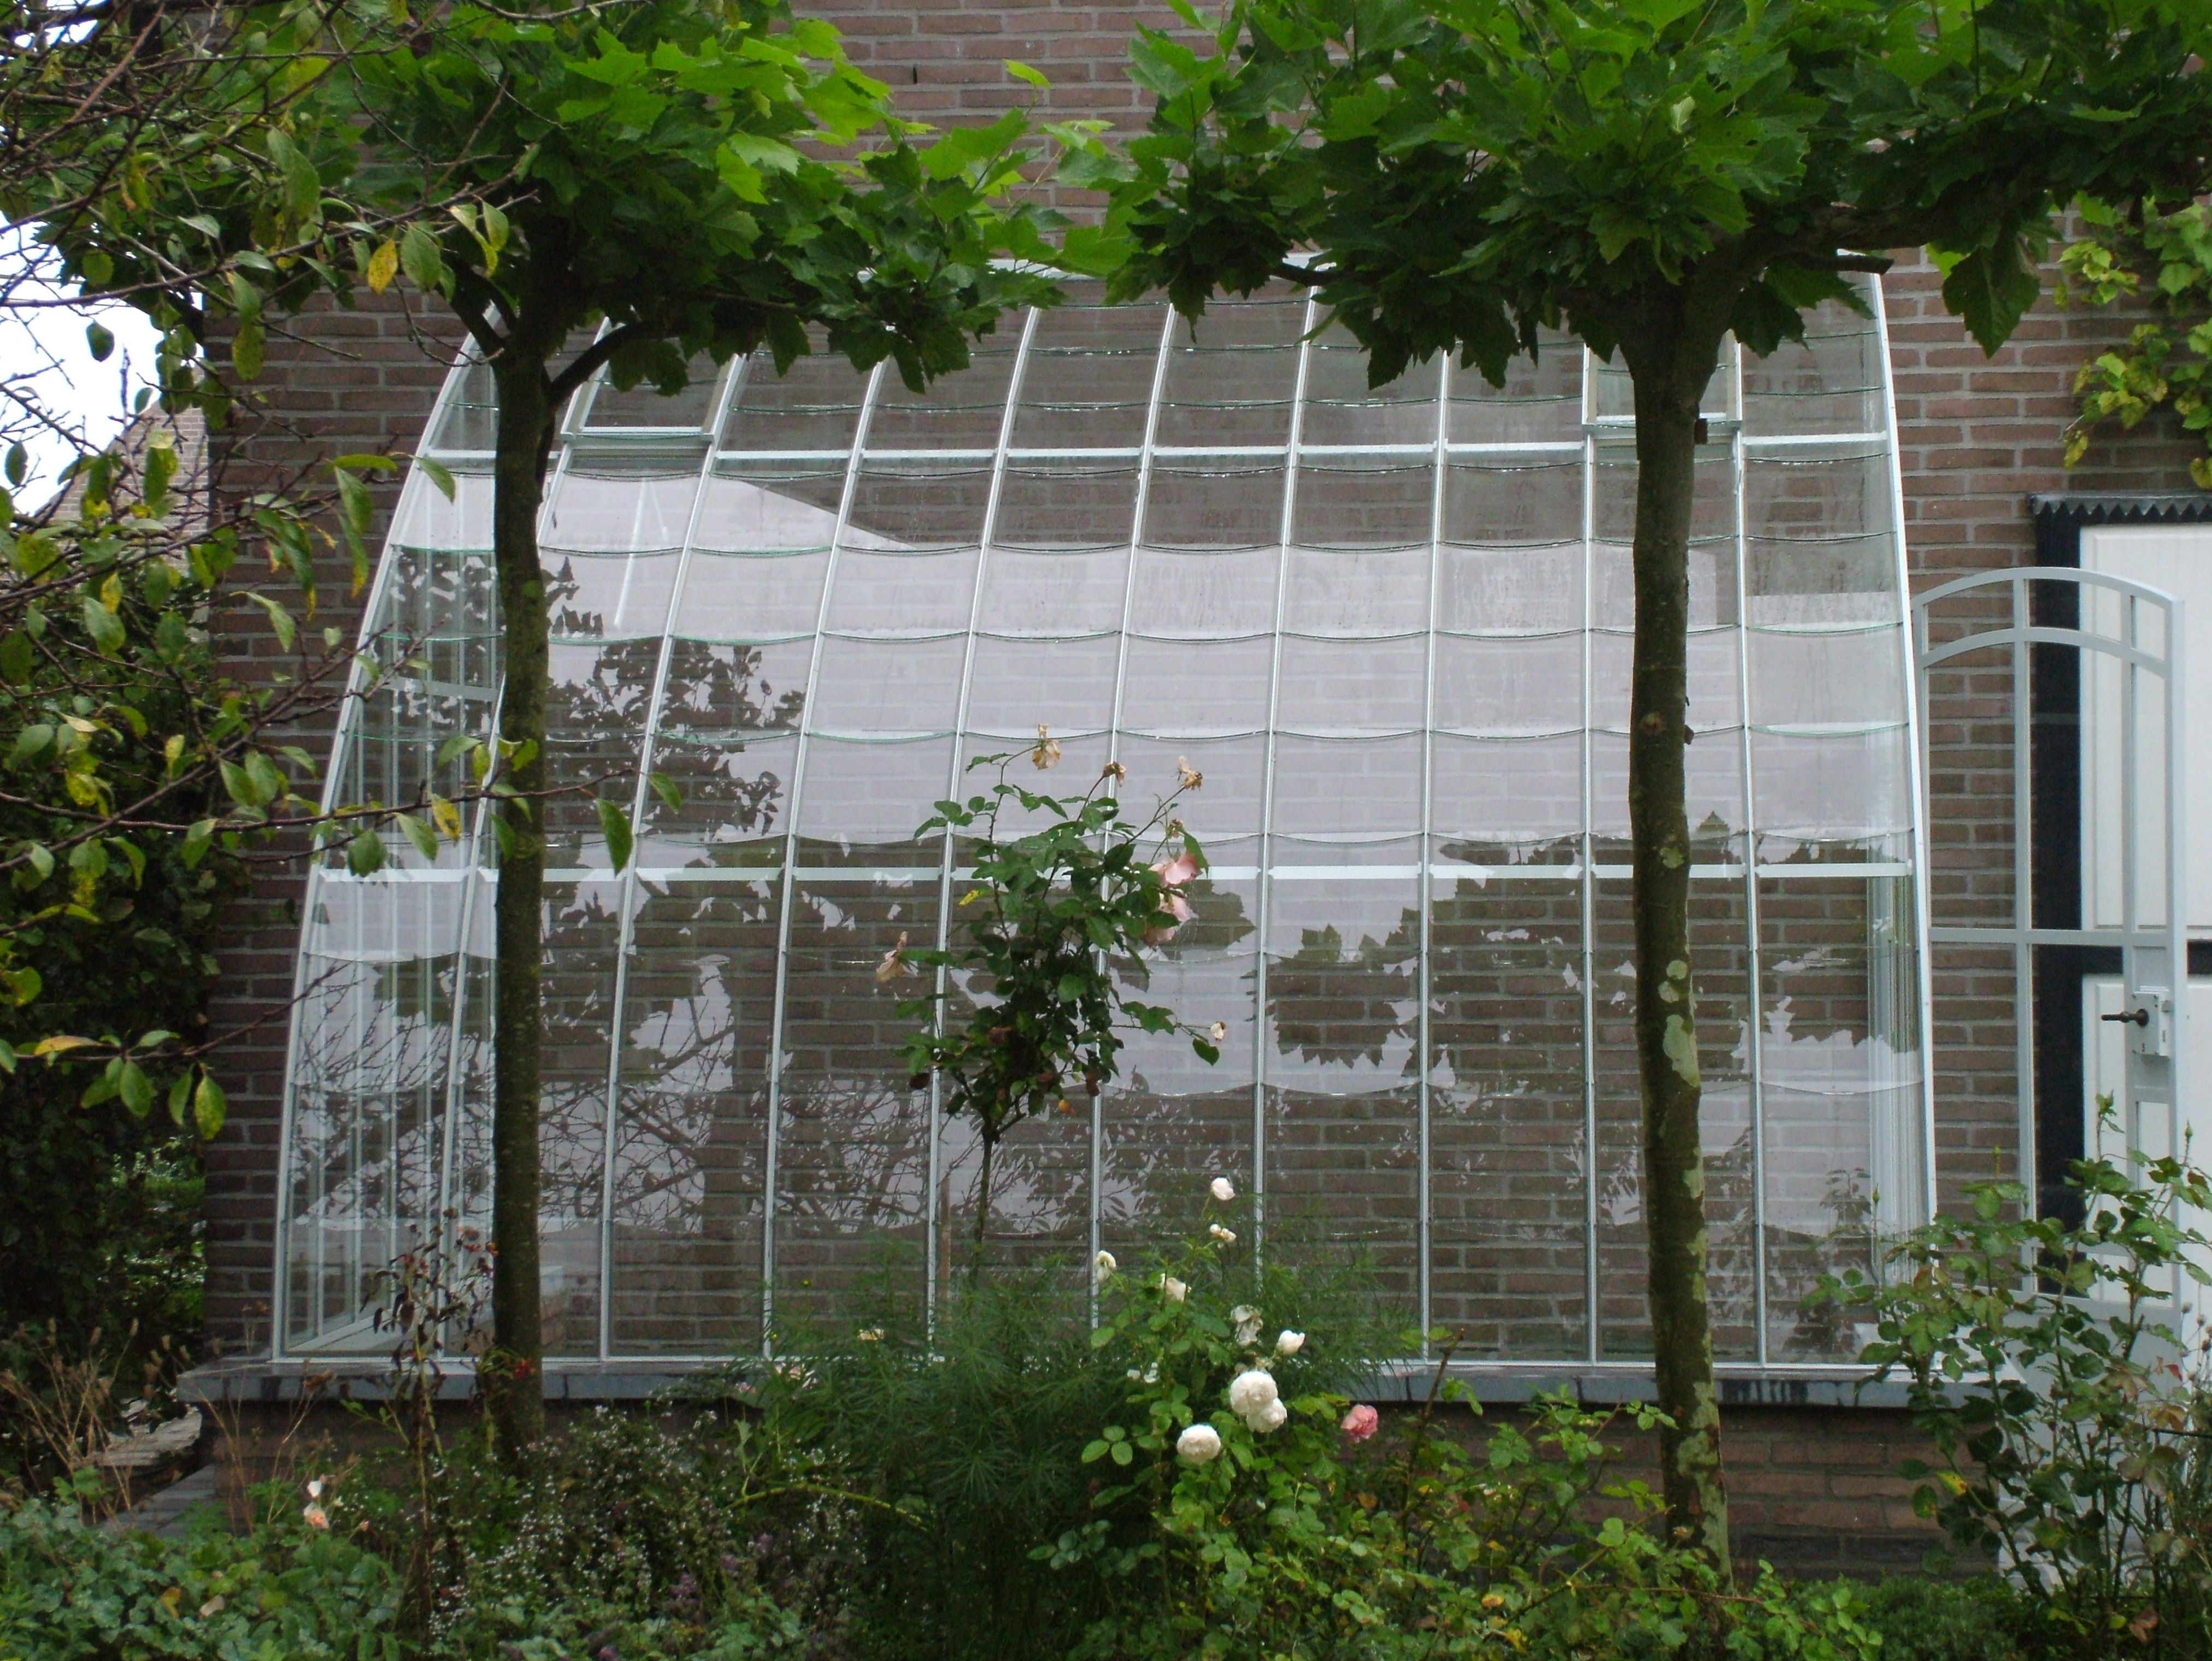 Serre En Fer Adossee Details De La Toiture Composee De Tuiles De Verre Mastiquees A L Ancienne Disposees En Ecailles Serre Jardin Jardins Serre